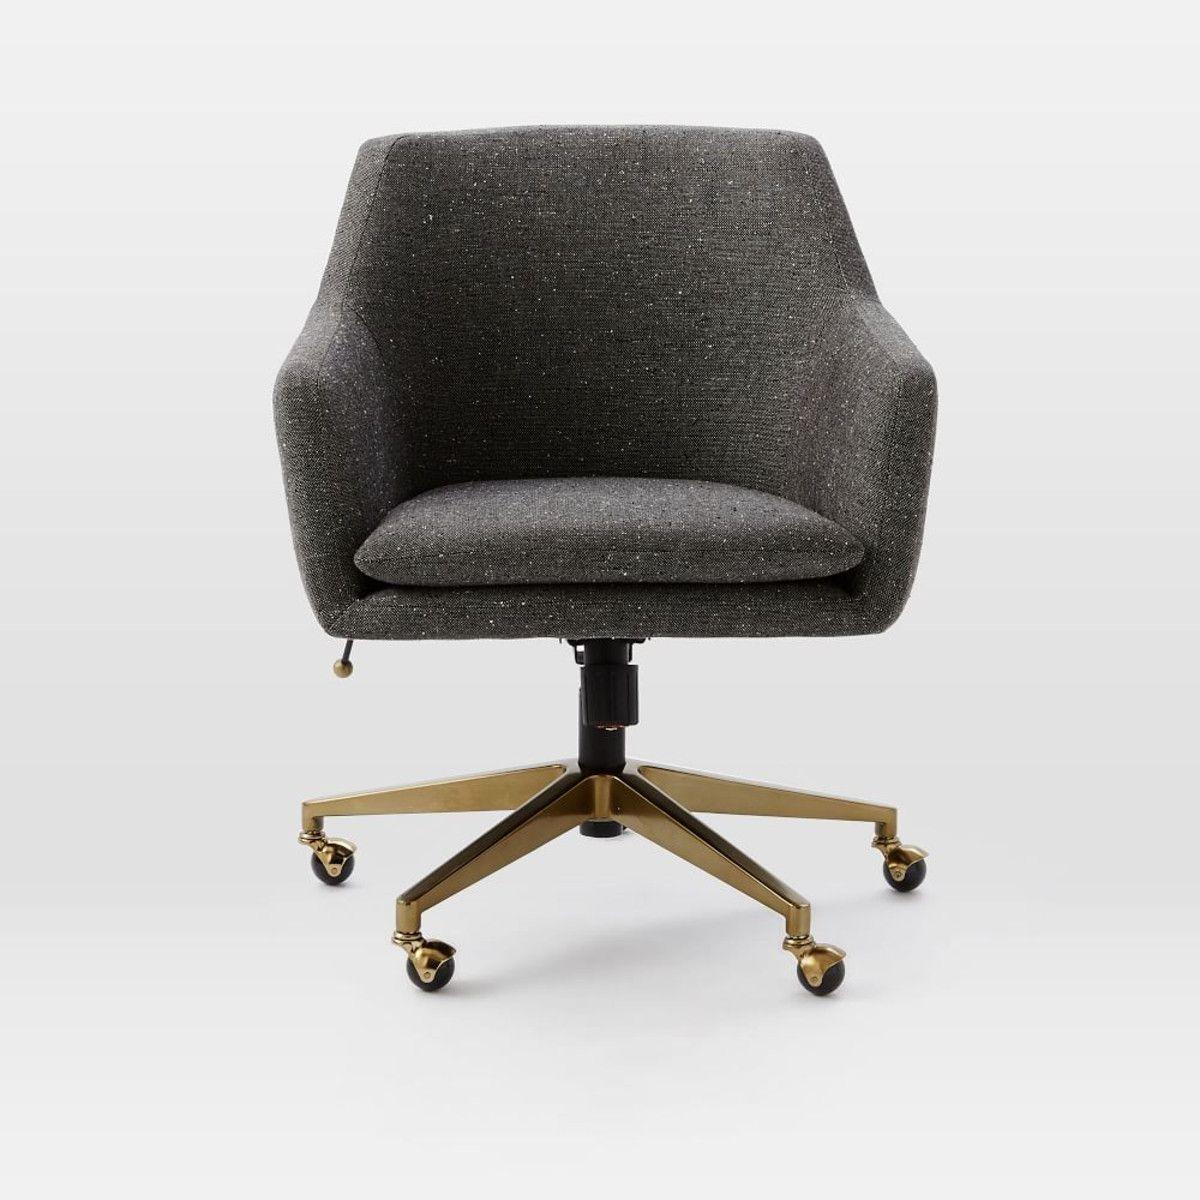 helvetica upholstered office chair | study | pinterest | house